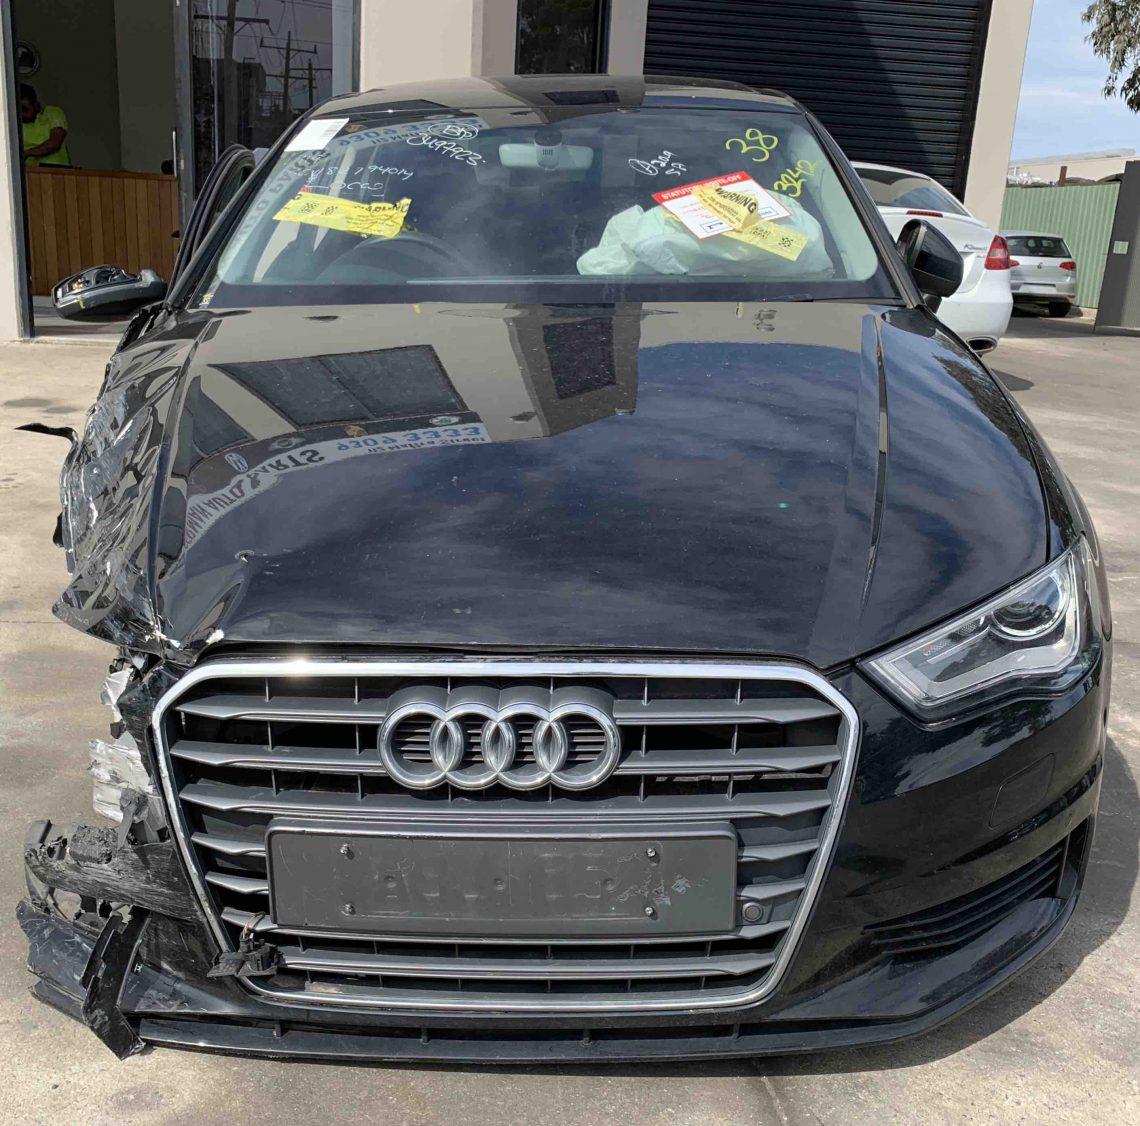 Audi A3 8v 2016 German Auto Parts Pty Ltd